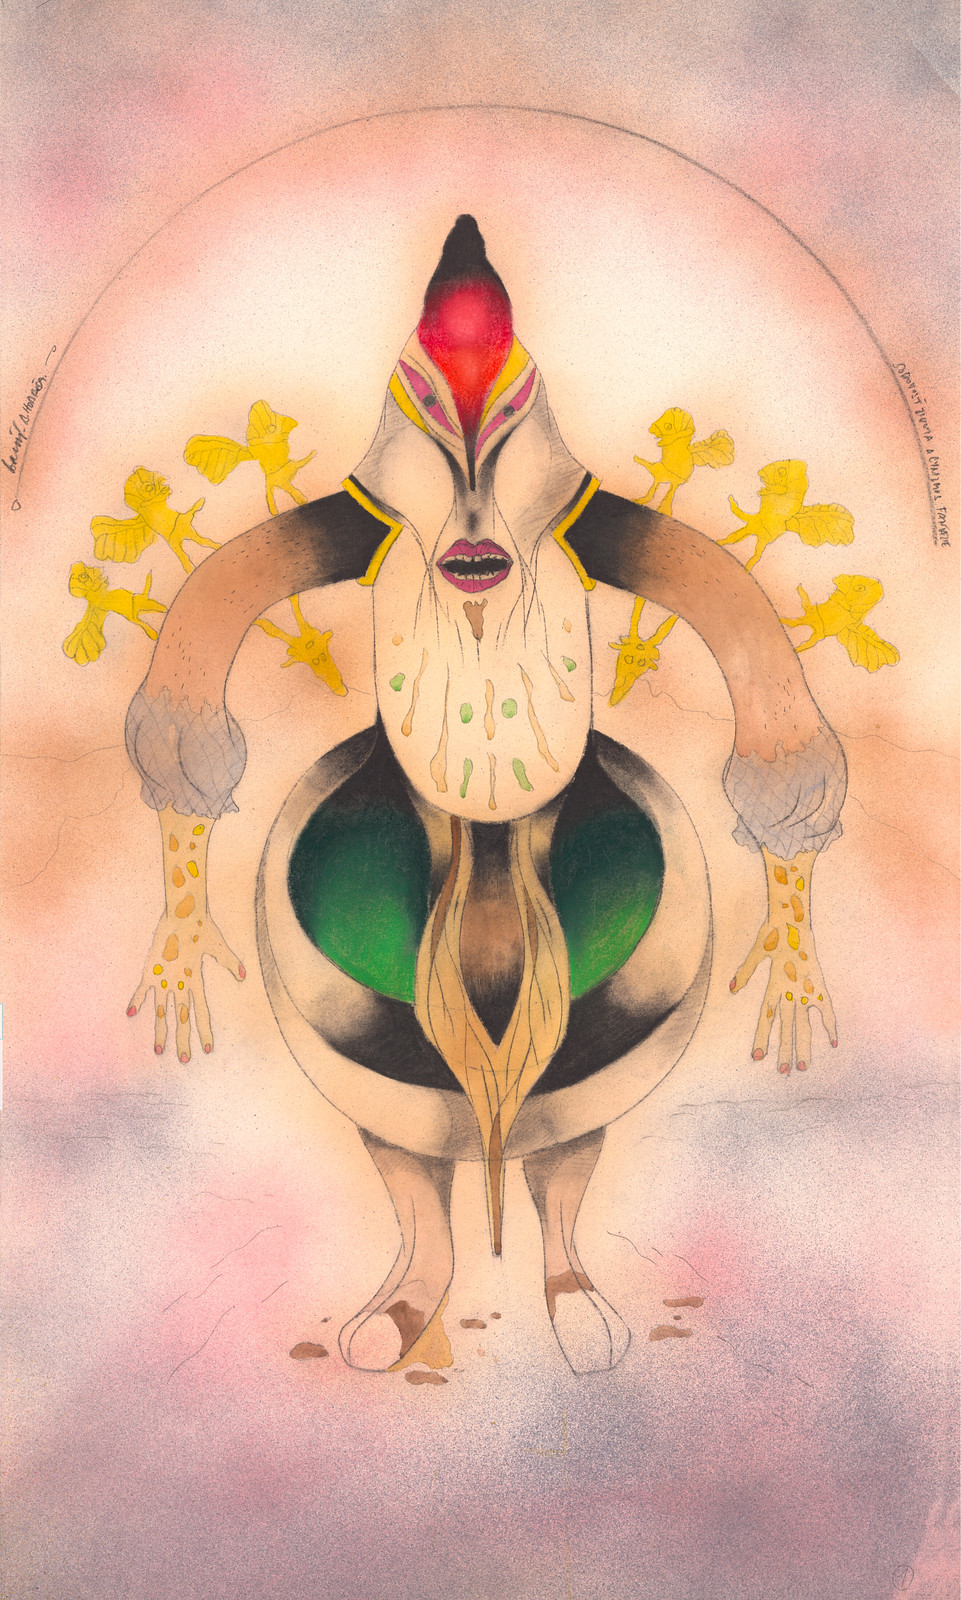 Karol Baron - Brutality & Cynicism Of Life Fantasy, 1990-2000